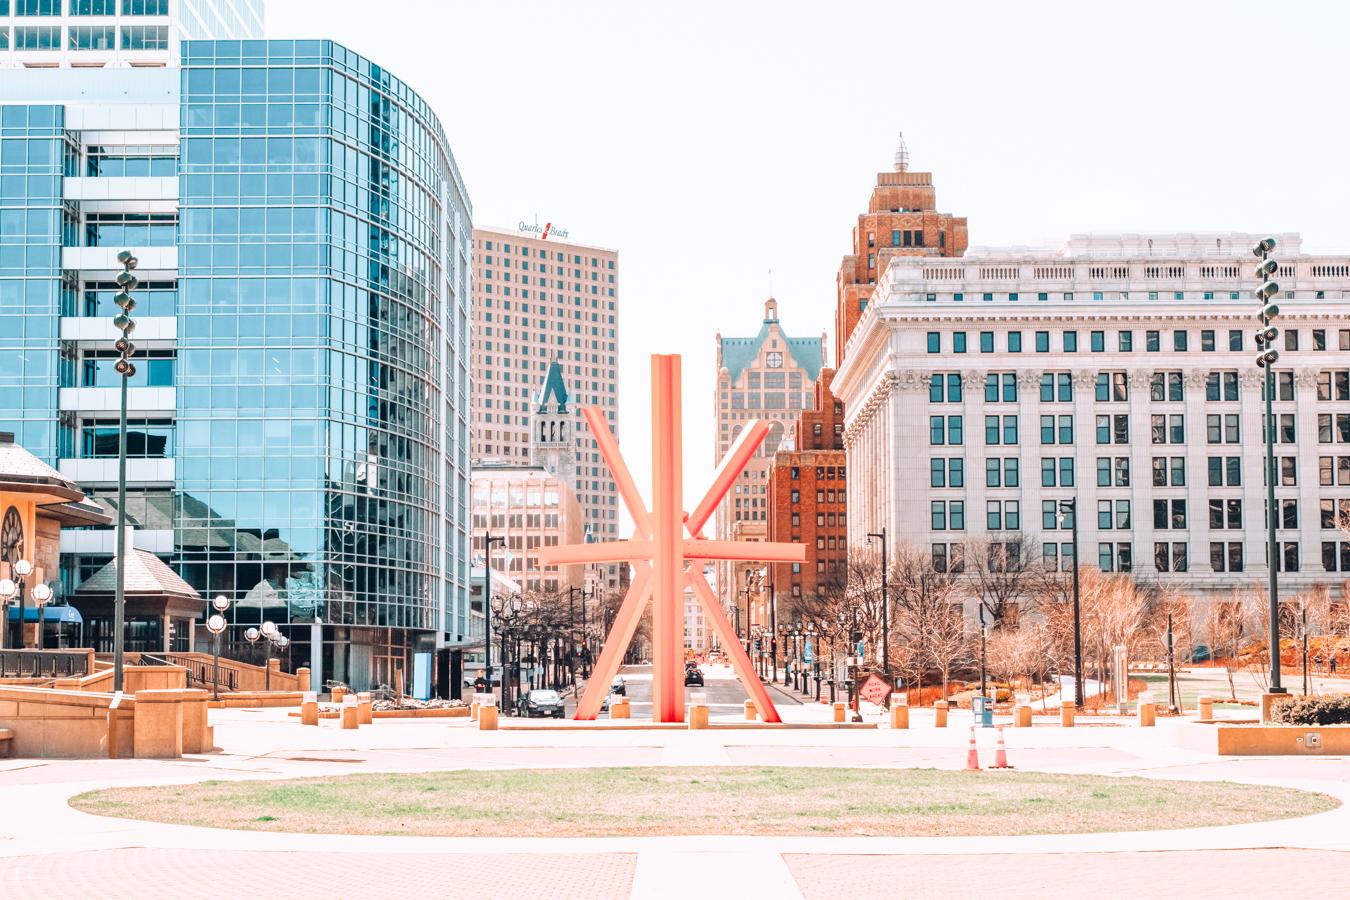 Orange sculpture and buildings